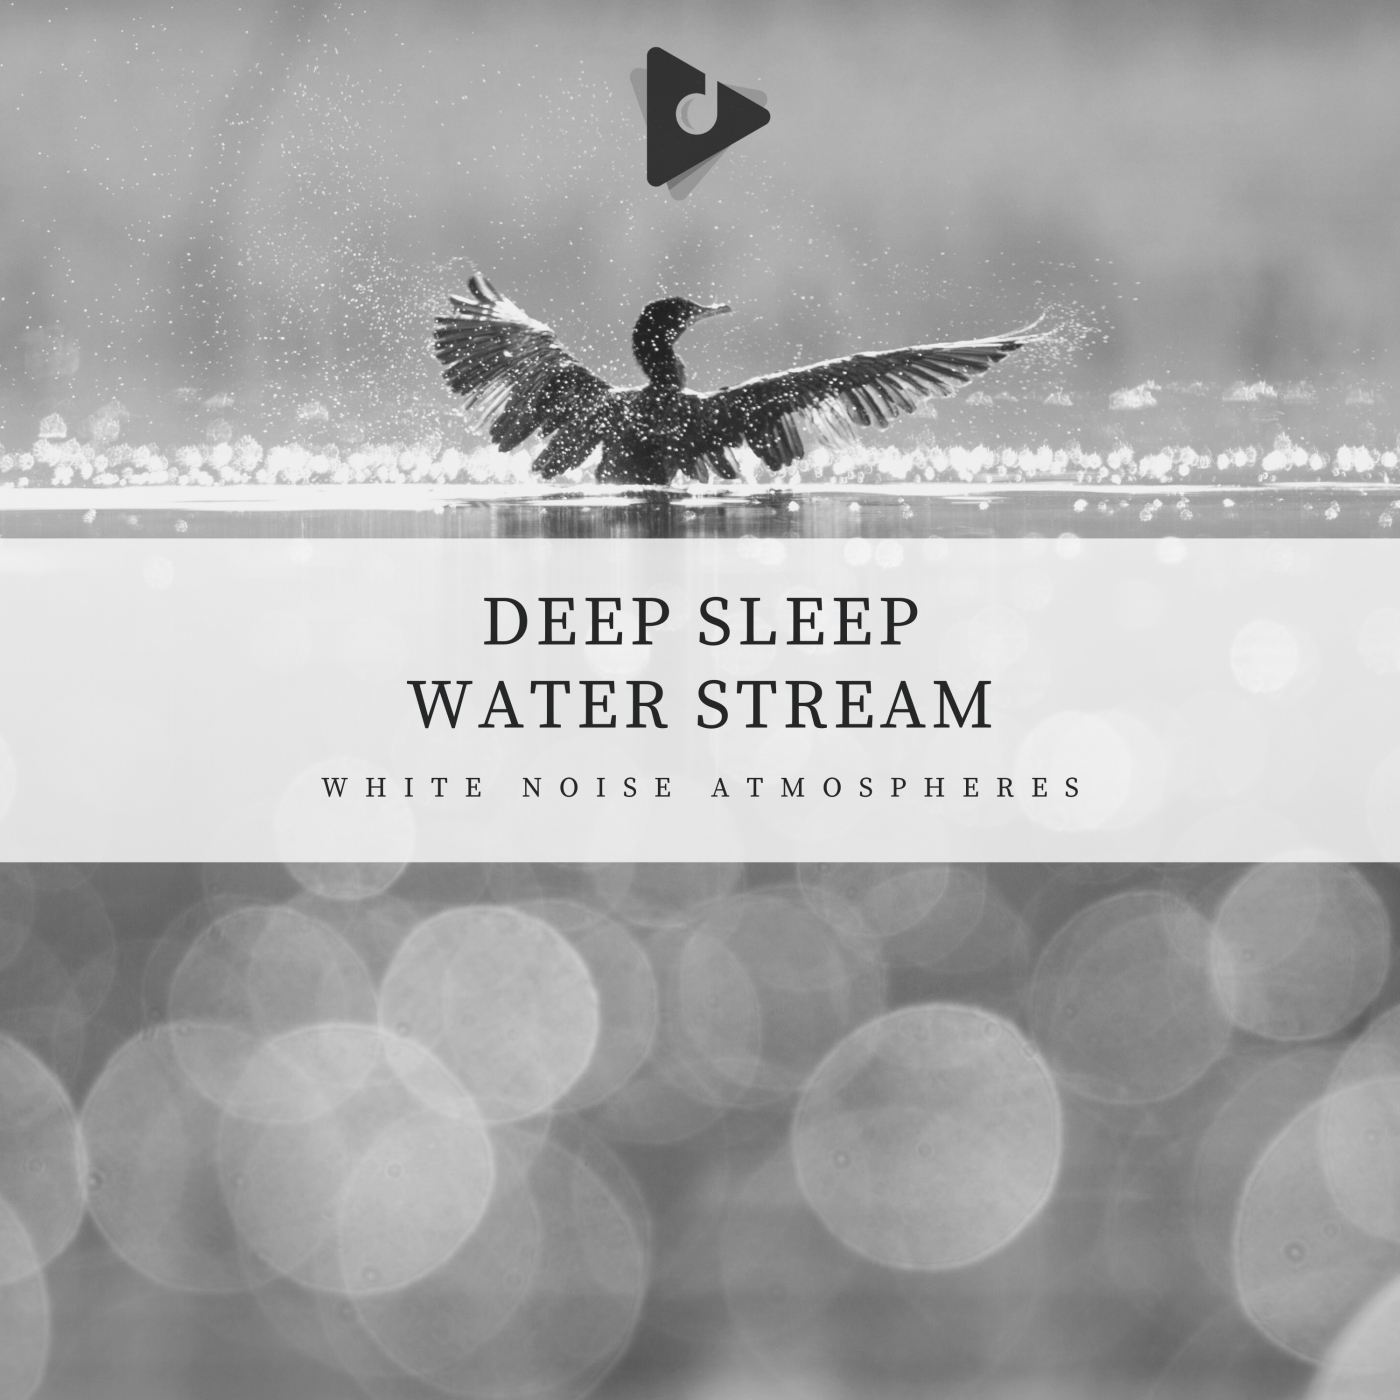 Deep Sleep Water Stream